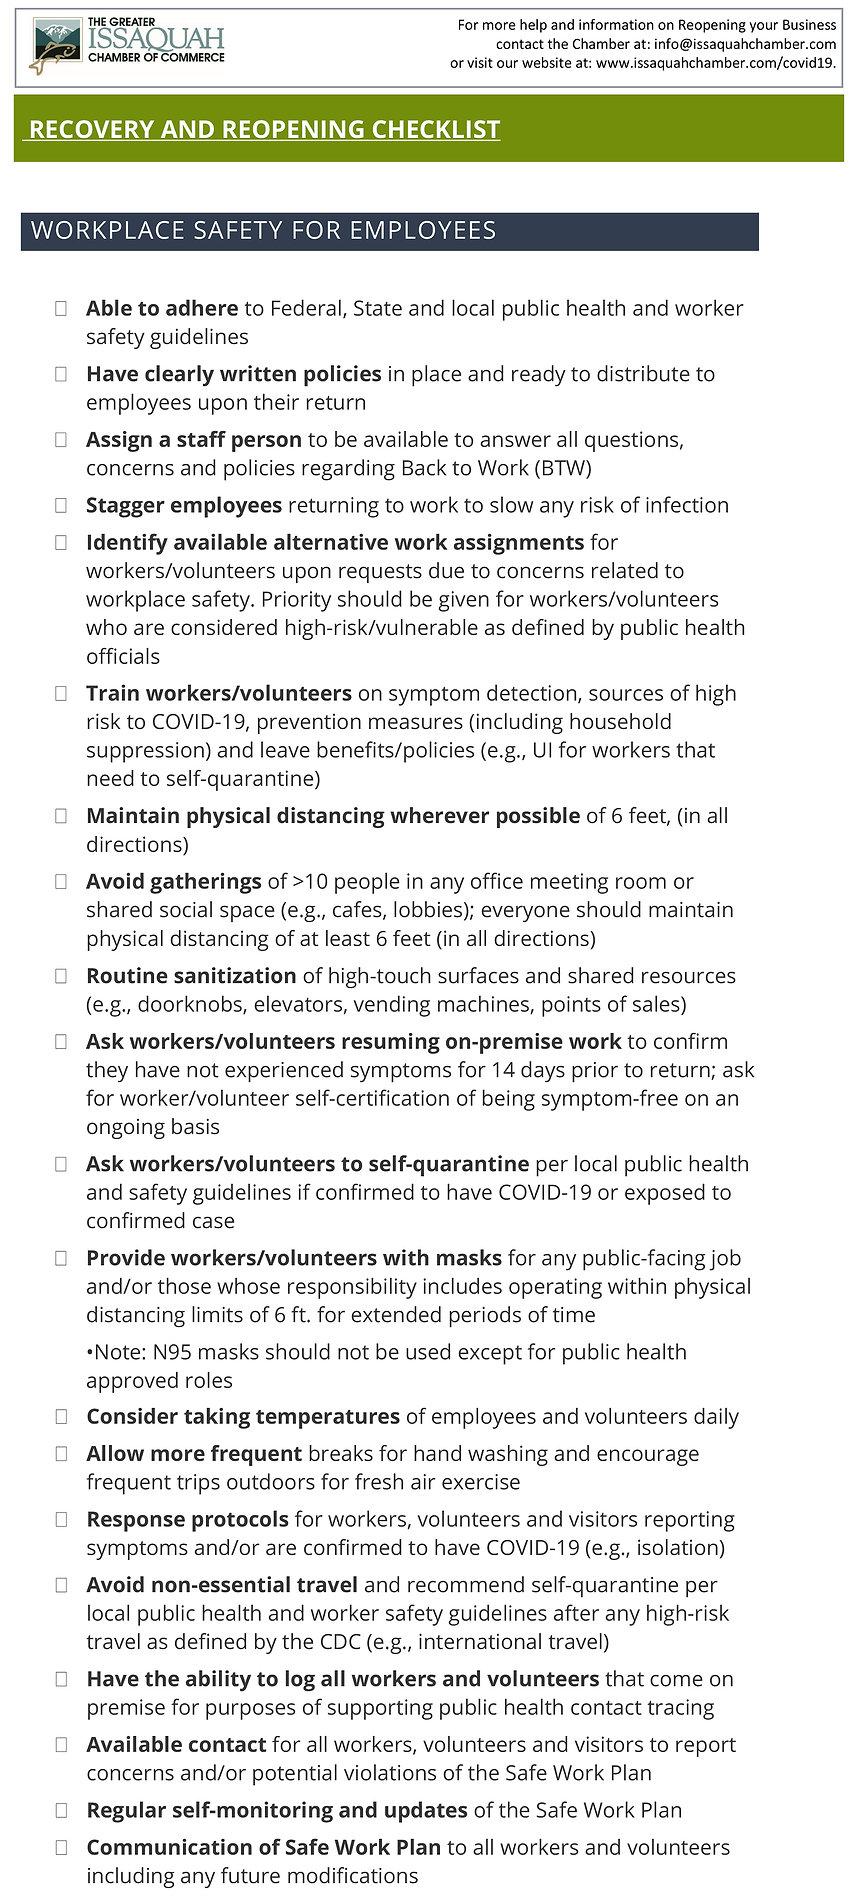 Employee Checklist-1.jpg